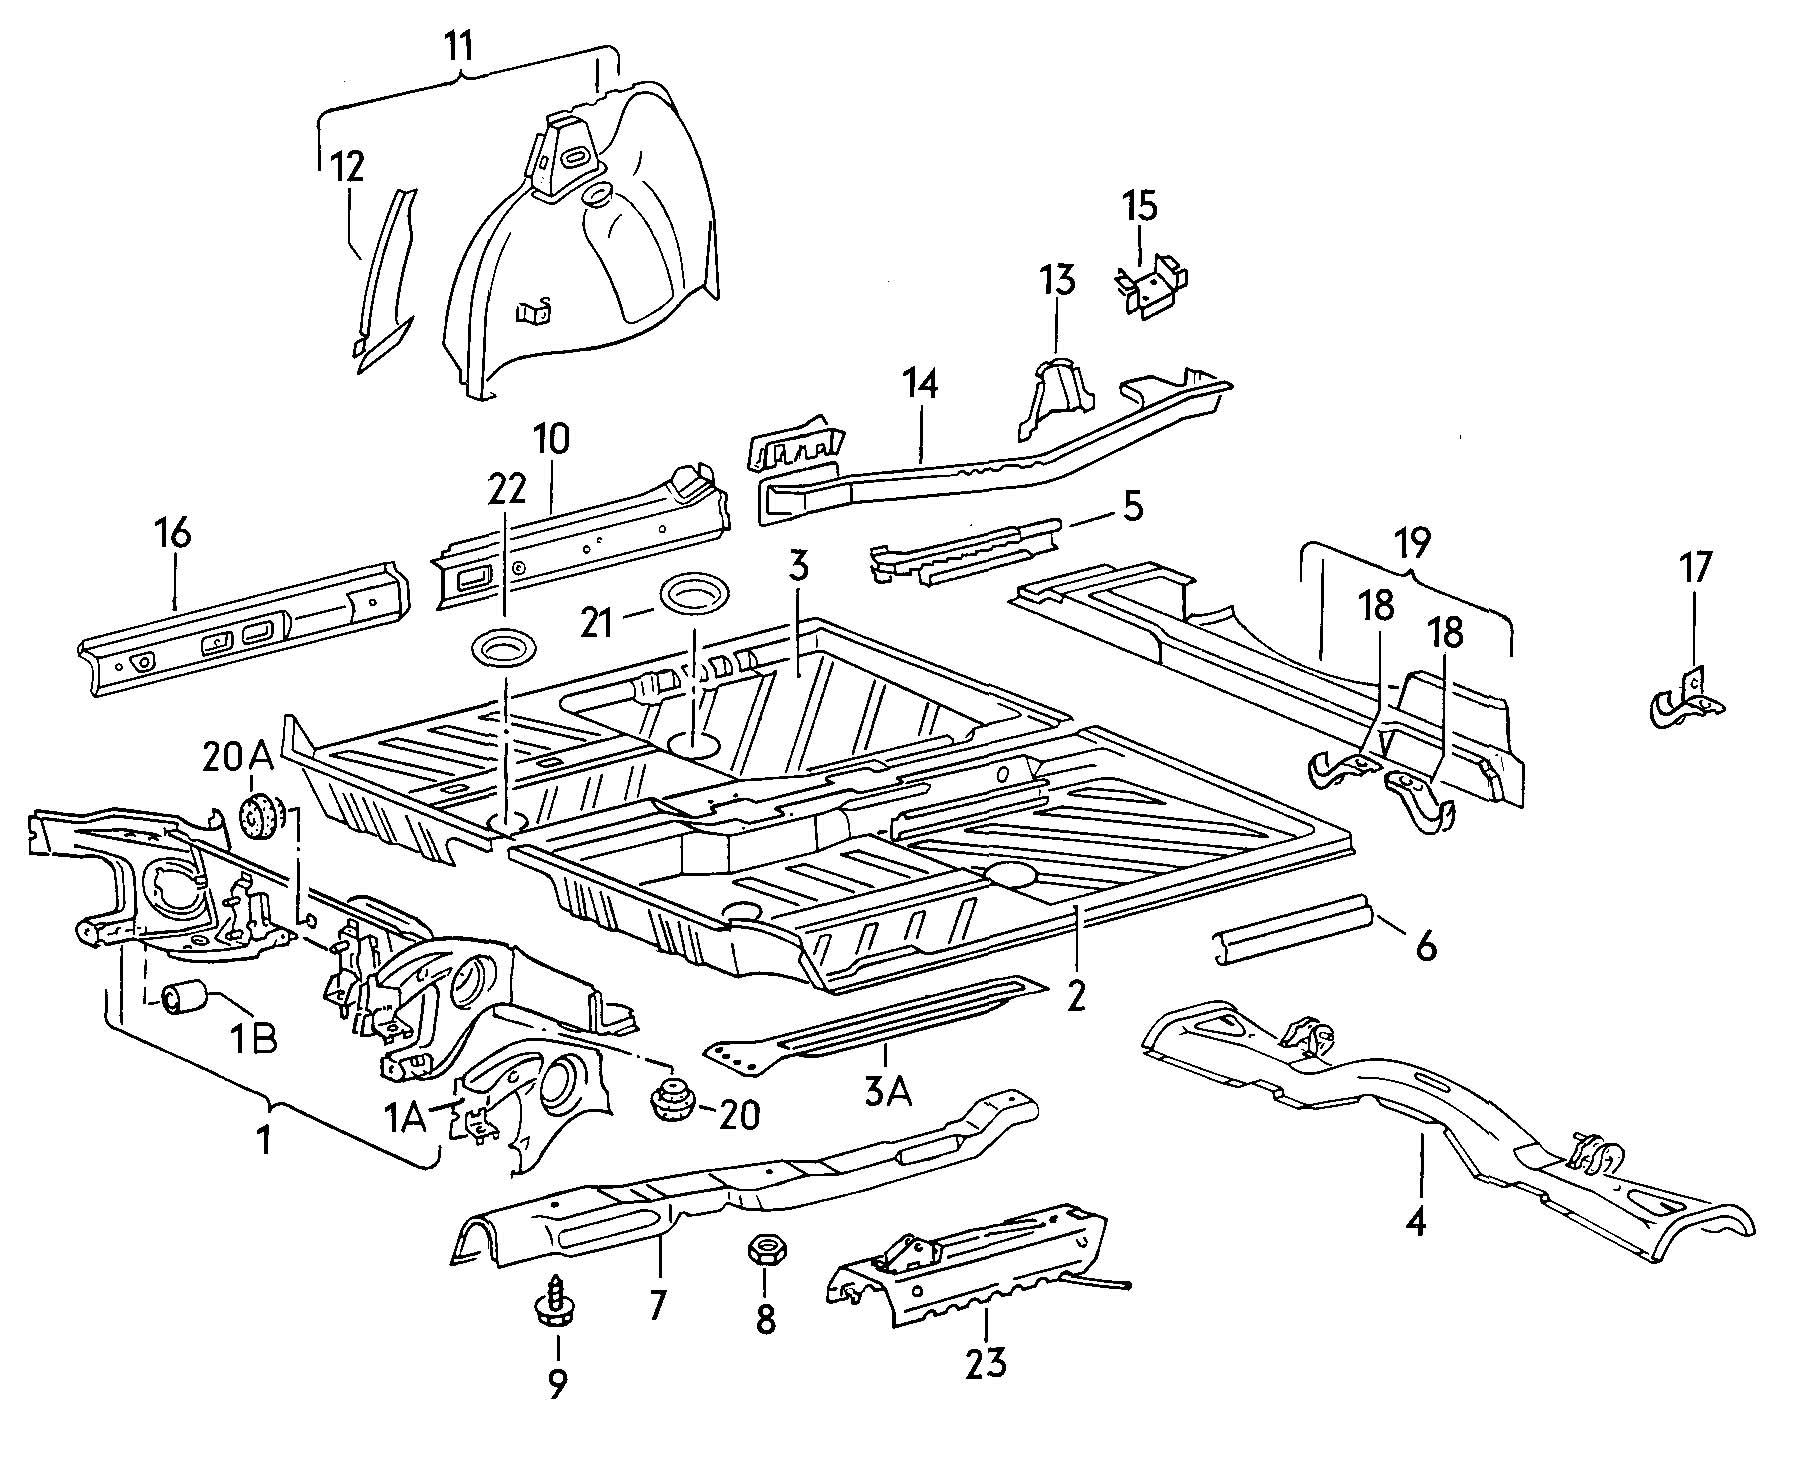 bild scirocco reparatur wiki fandom. Black Bedroom Furniture Sets. Home Design Ideas